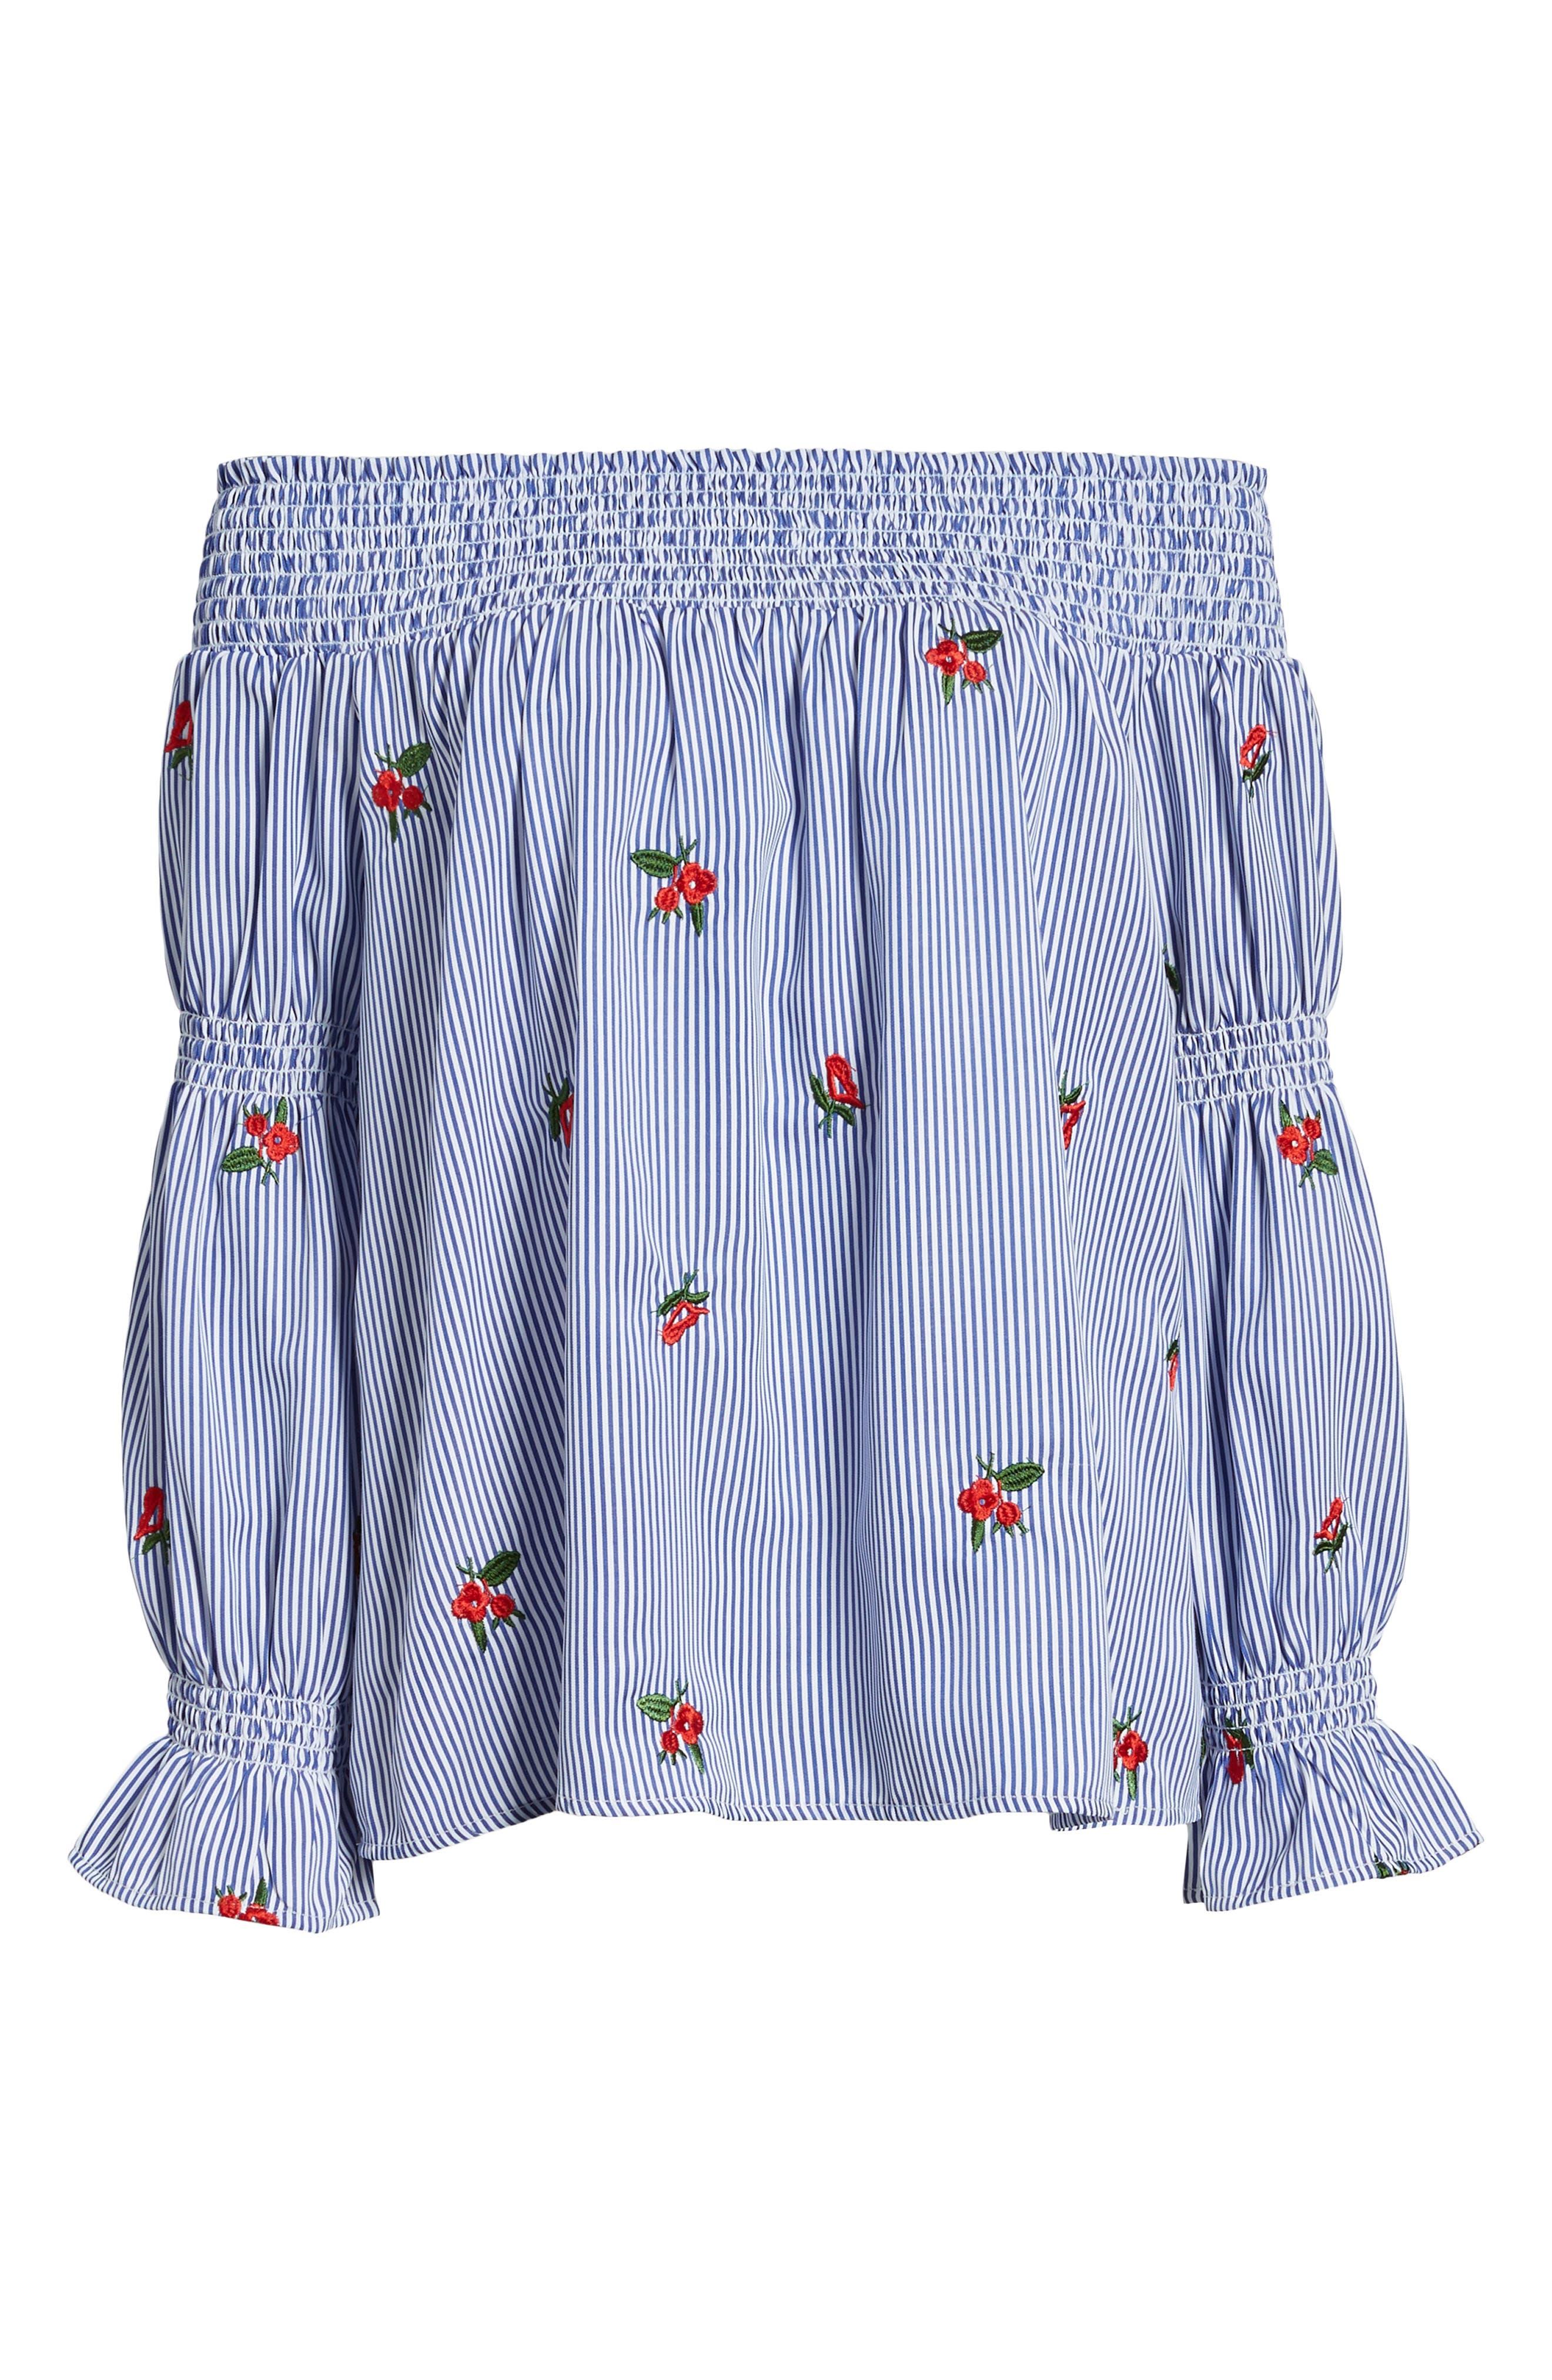 Floral Embroidered Stripe Off the Shoulder Top,                             Alternate thumbnail 7, color,                             400